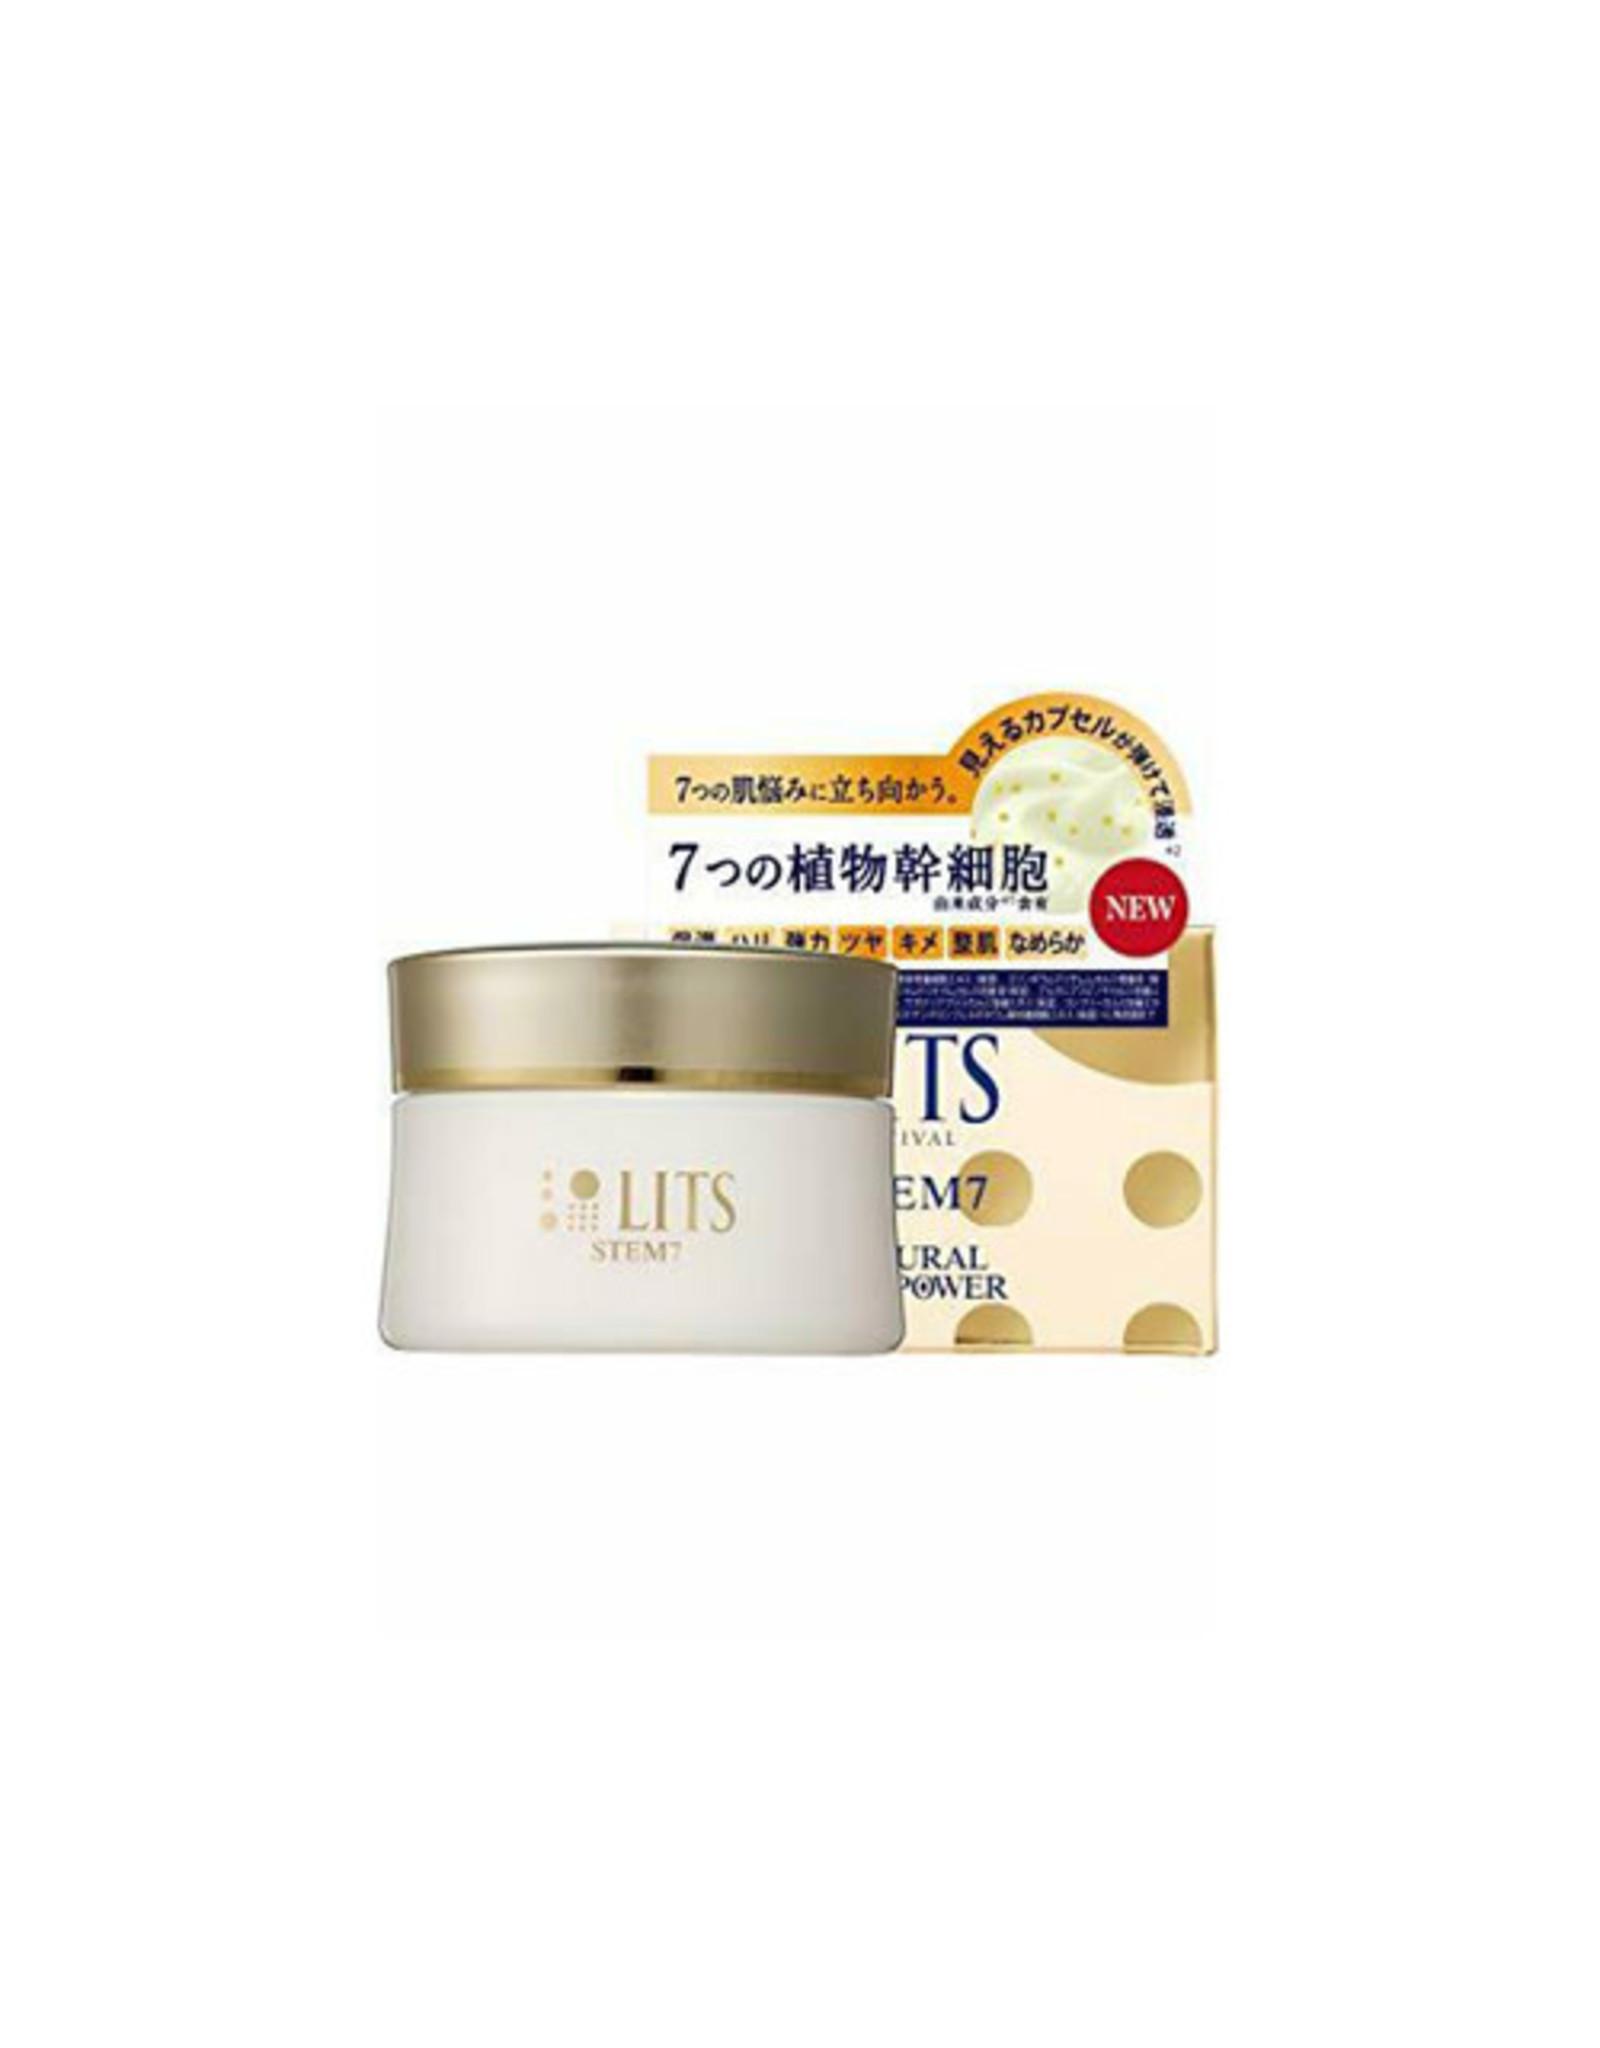 LITS LITS Revival Stem7 Cream